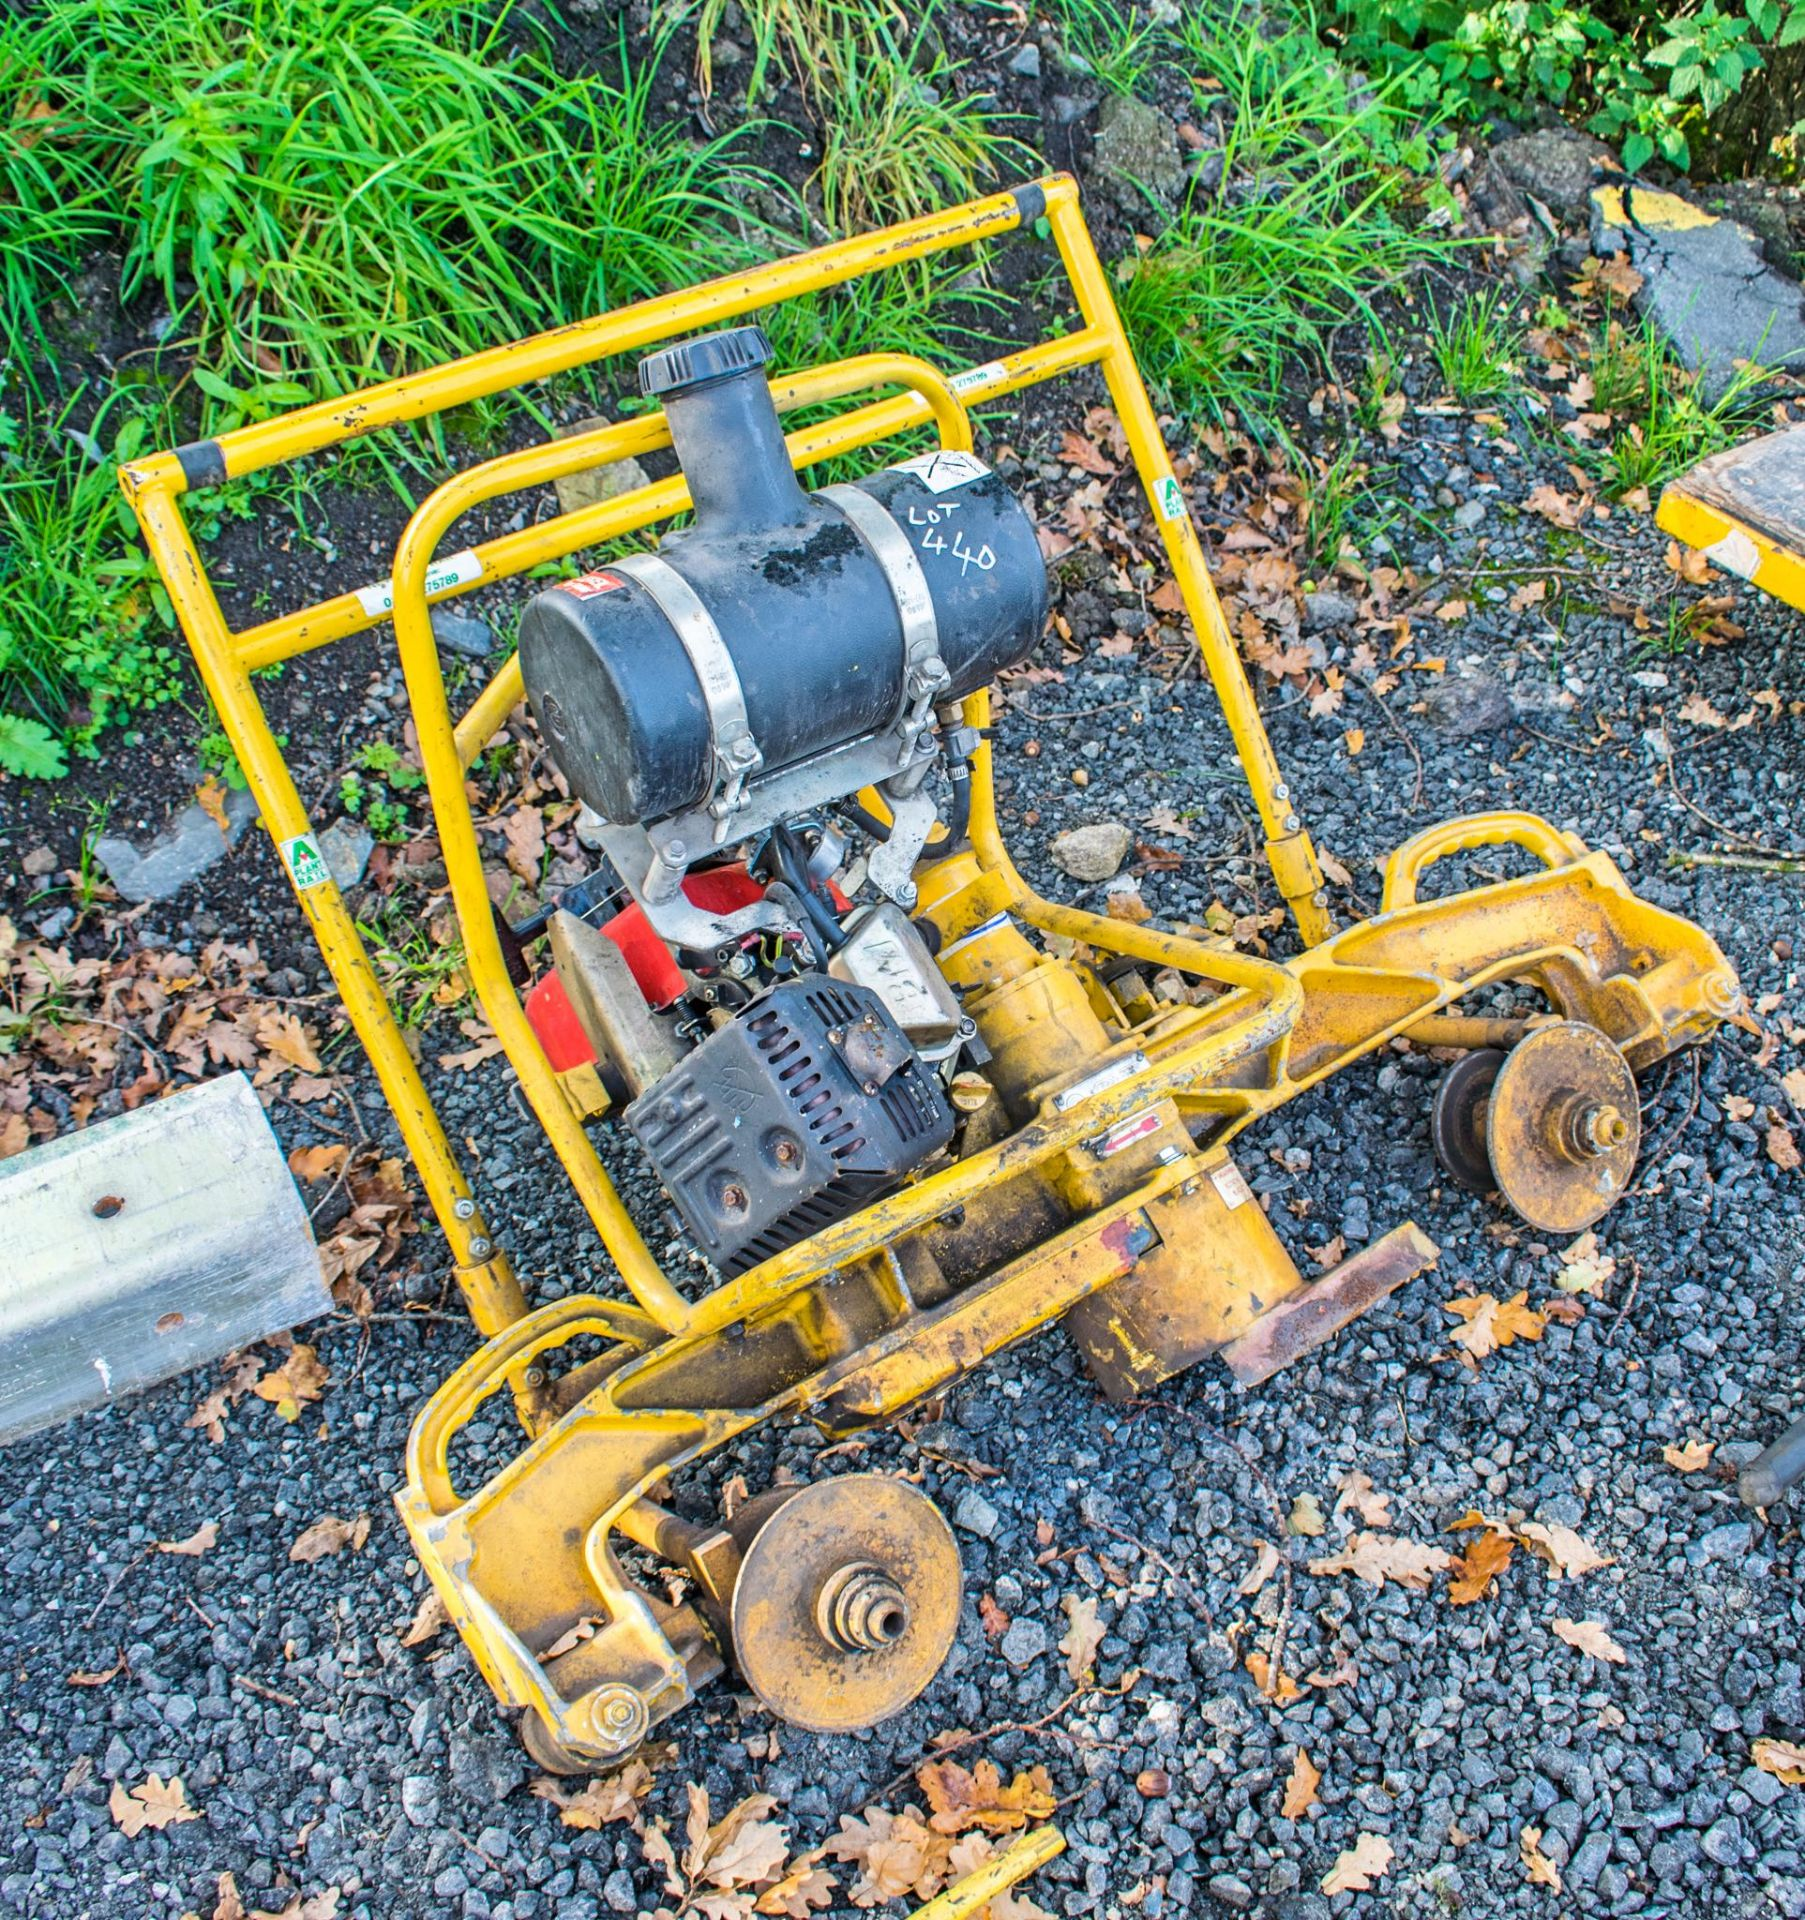 Geismar petrol driven rail grinder A747461